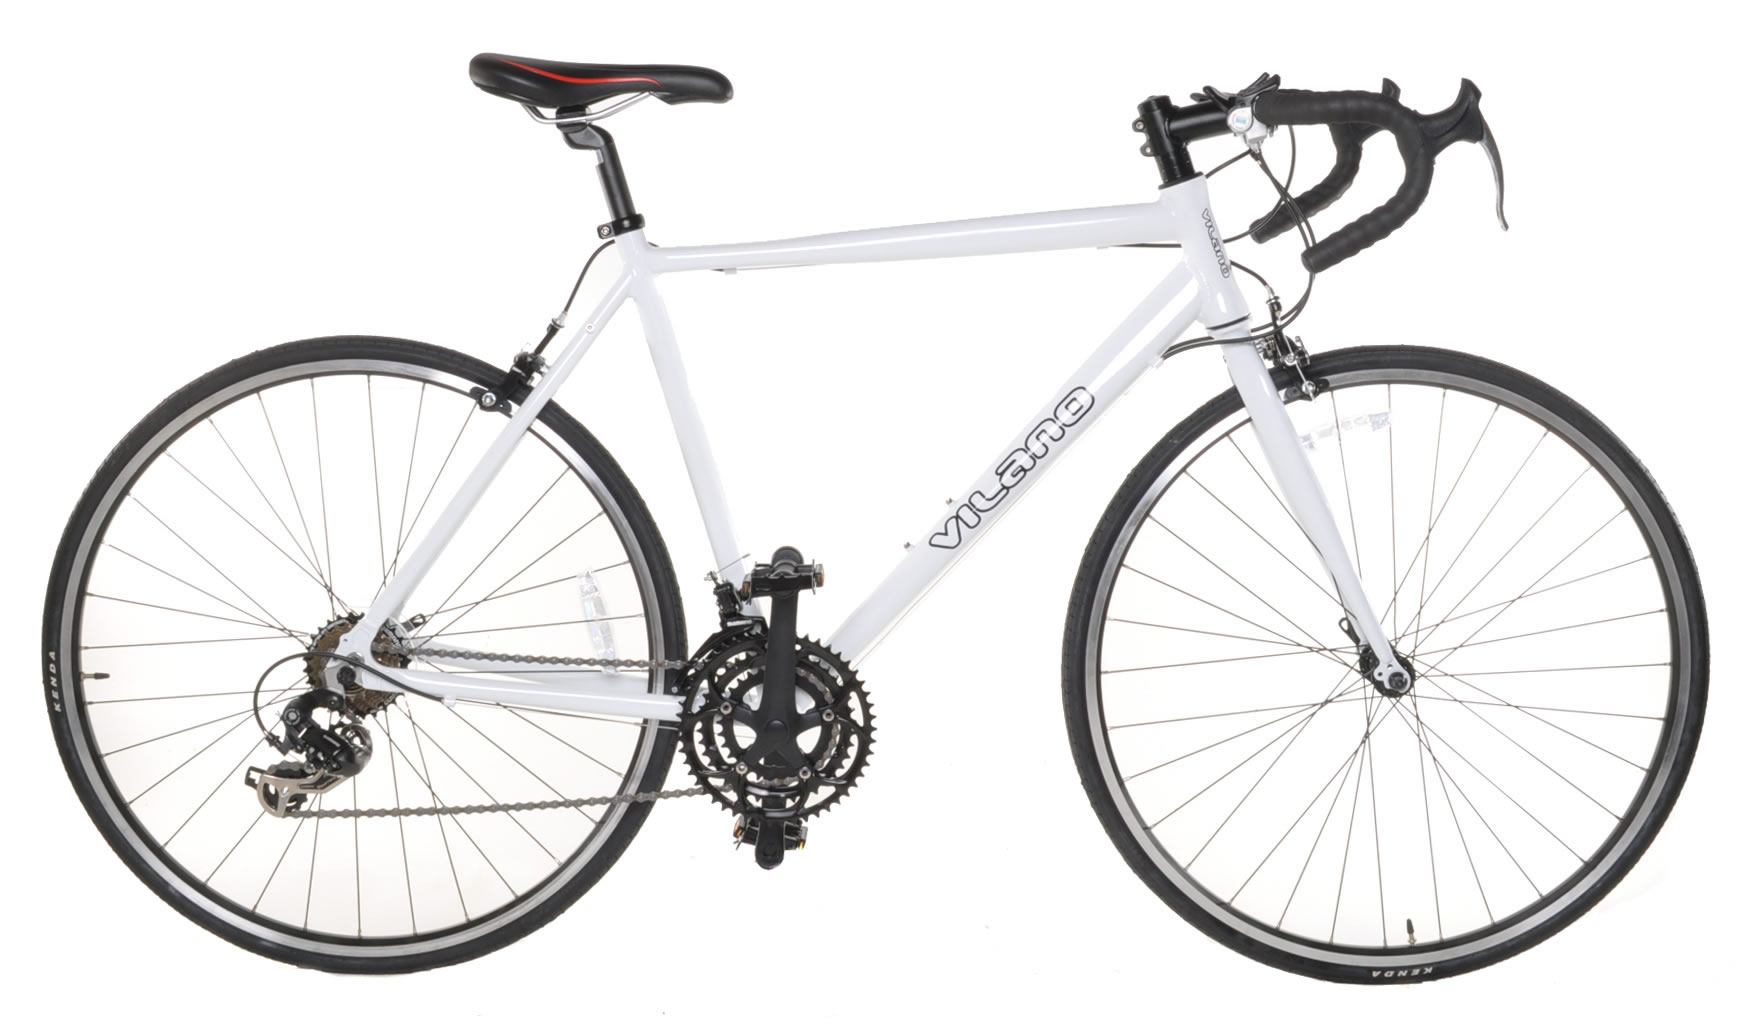 Vilano Aluminum Road Bike 21 Speed Shimano White 54cm Medium | eBay